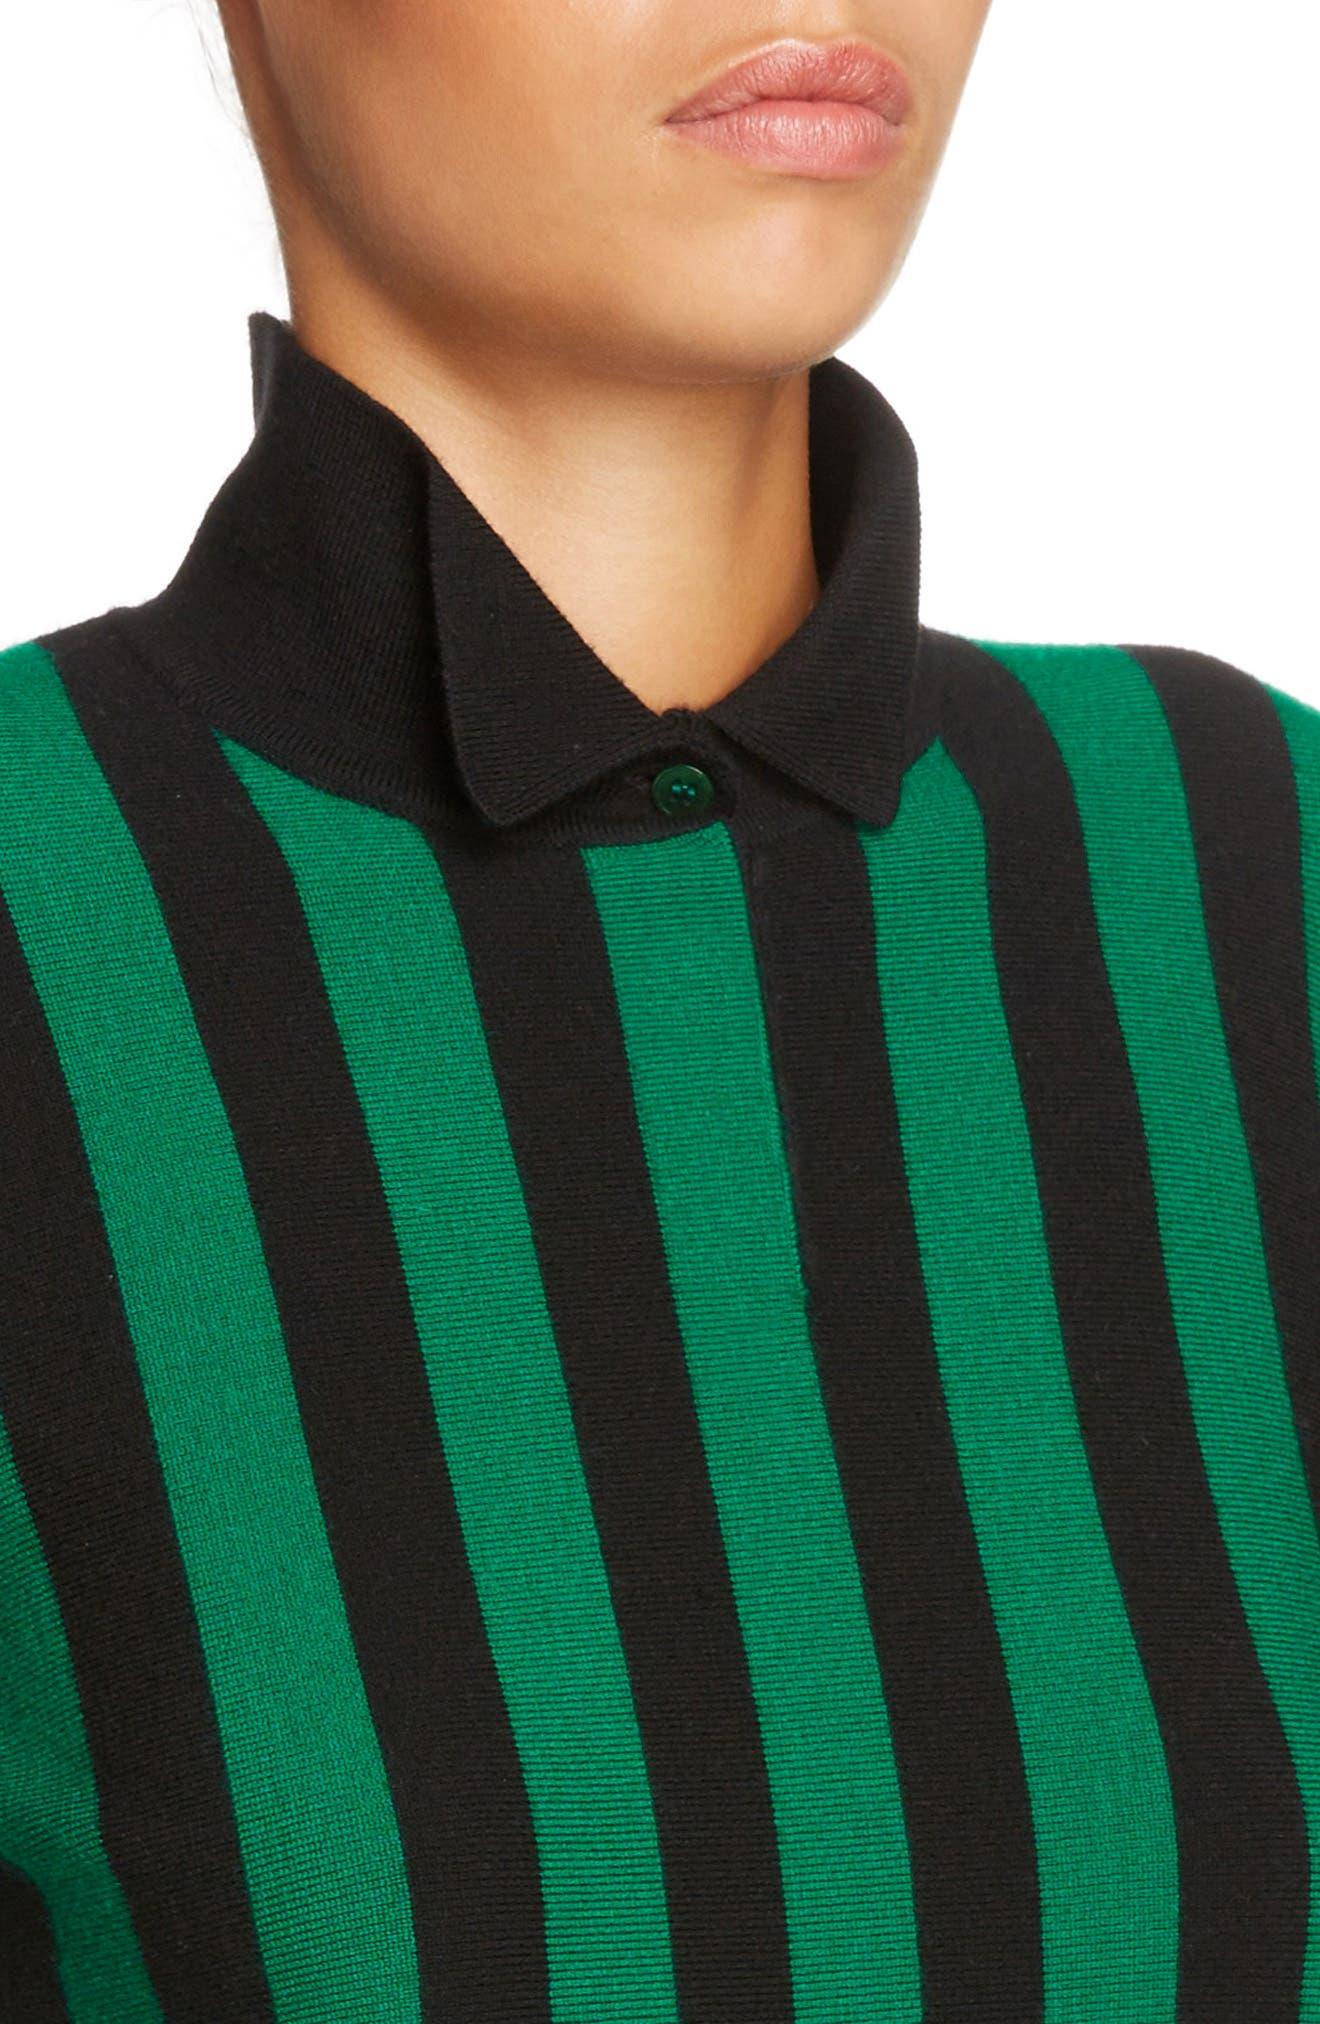 Stripe High Neck Sweater,                             Alternate thumbnail 4, color,                             Emerald